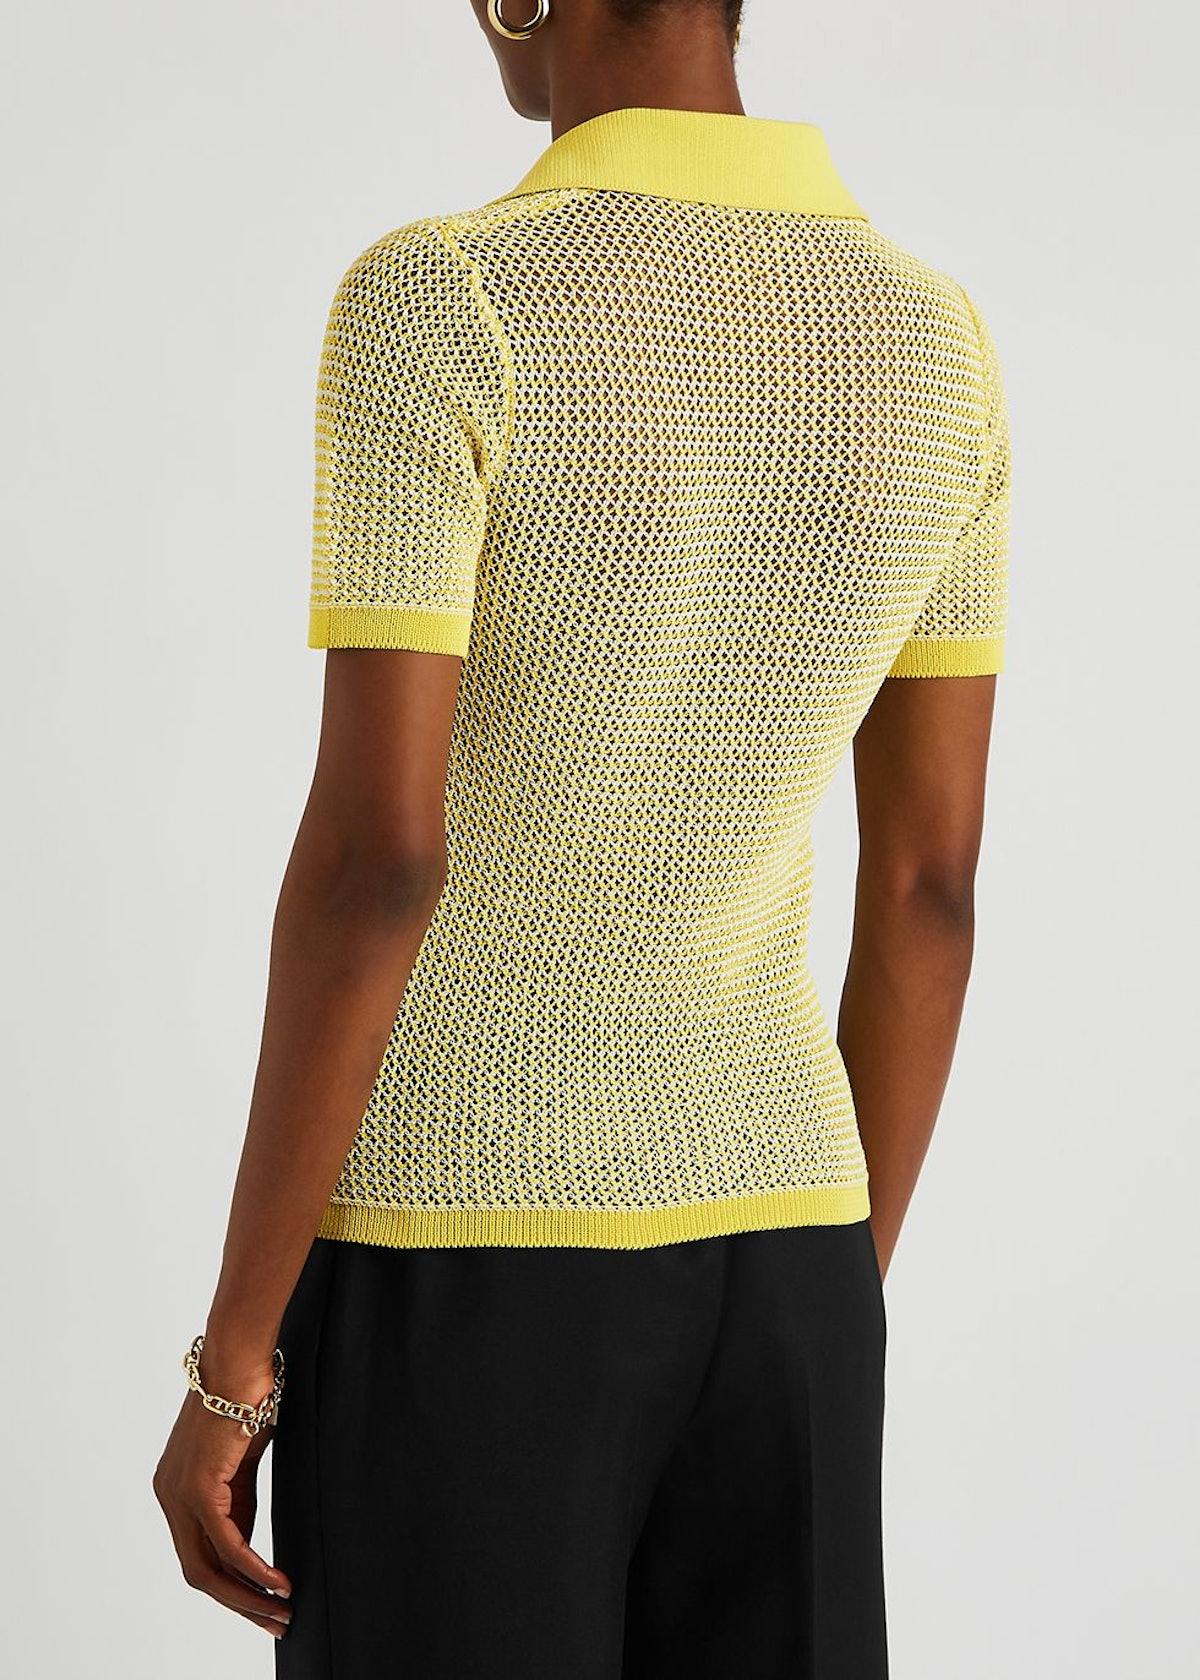 Yellow open-knit mesh polo shirt: image 1